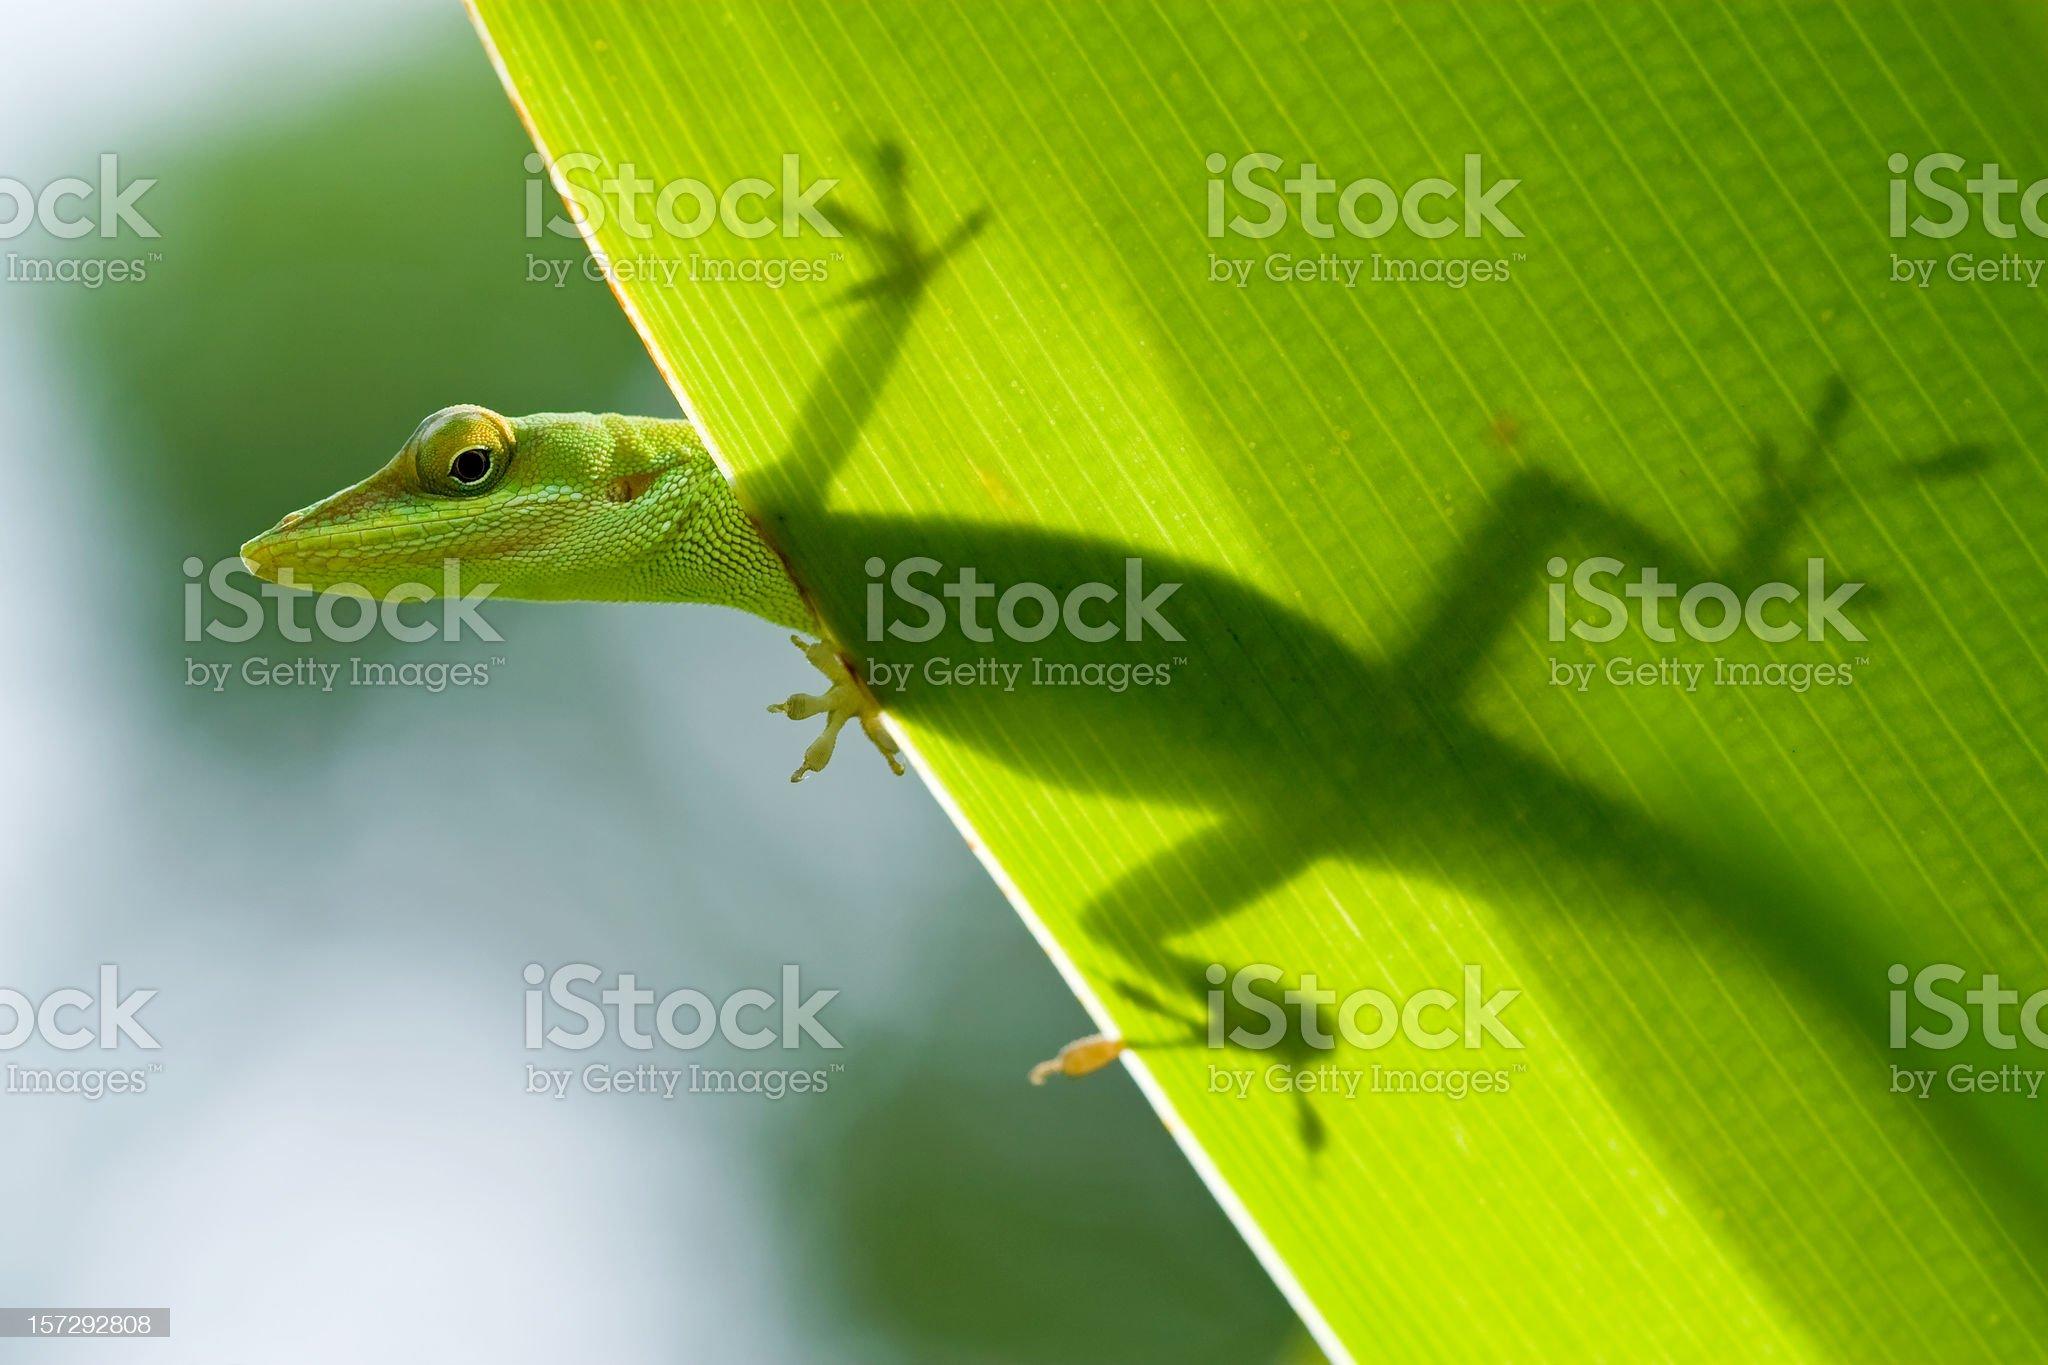 Lizard Silhouette through leaf royalty-free stock photo